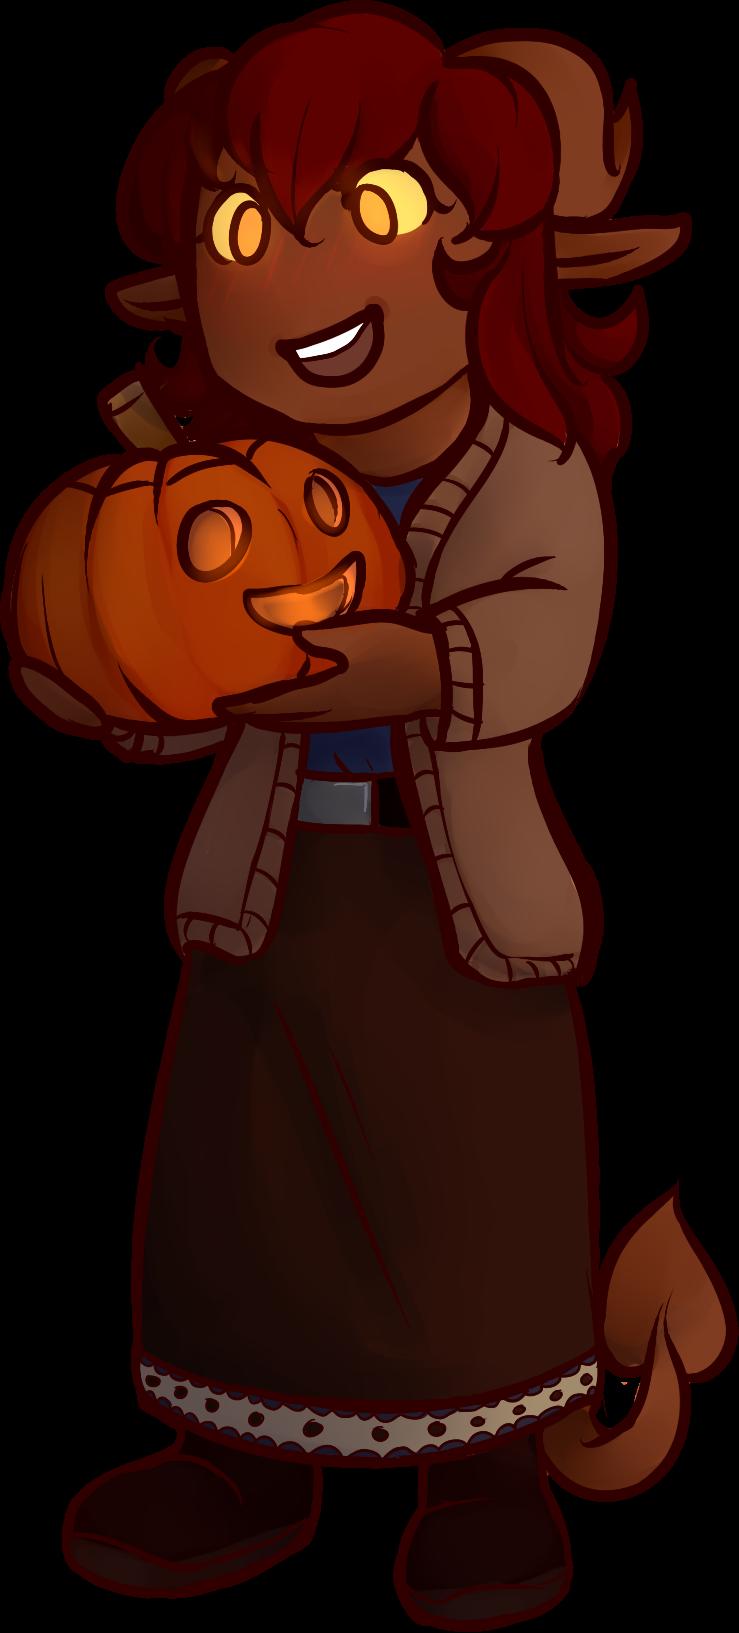 Kassie Finds a Pumpkin